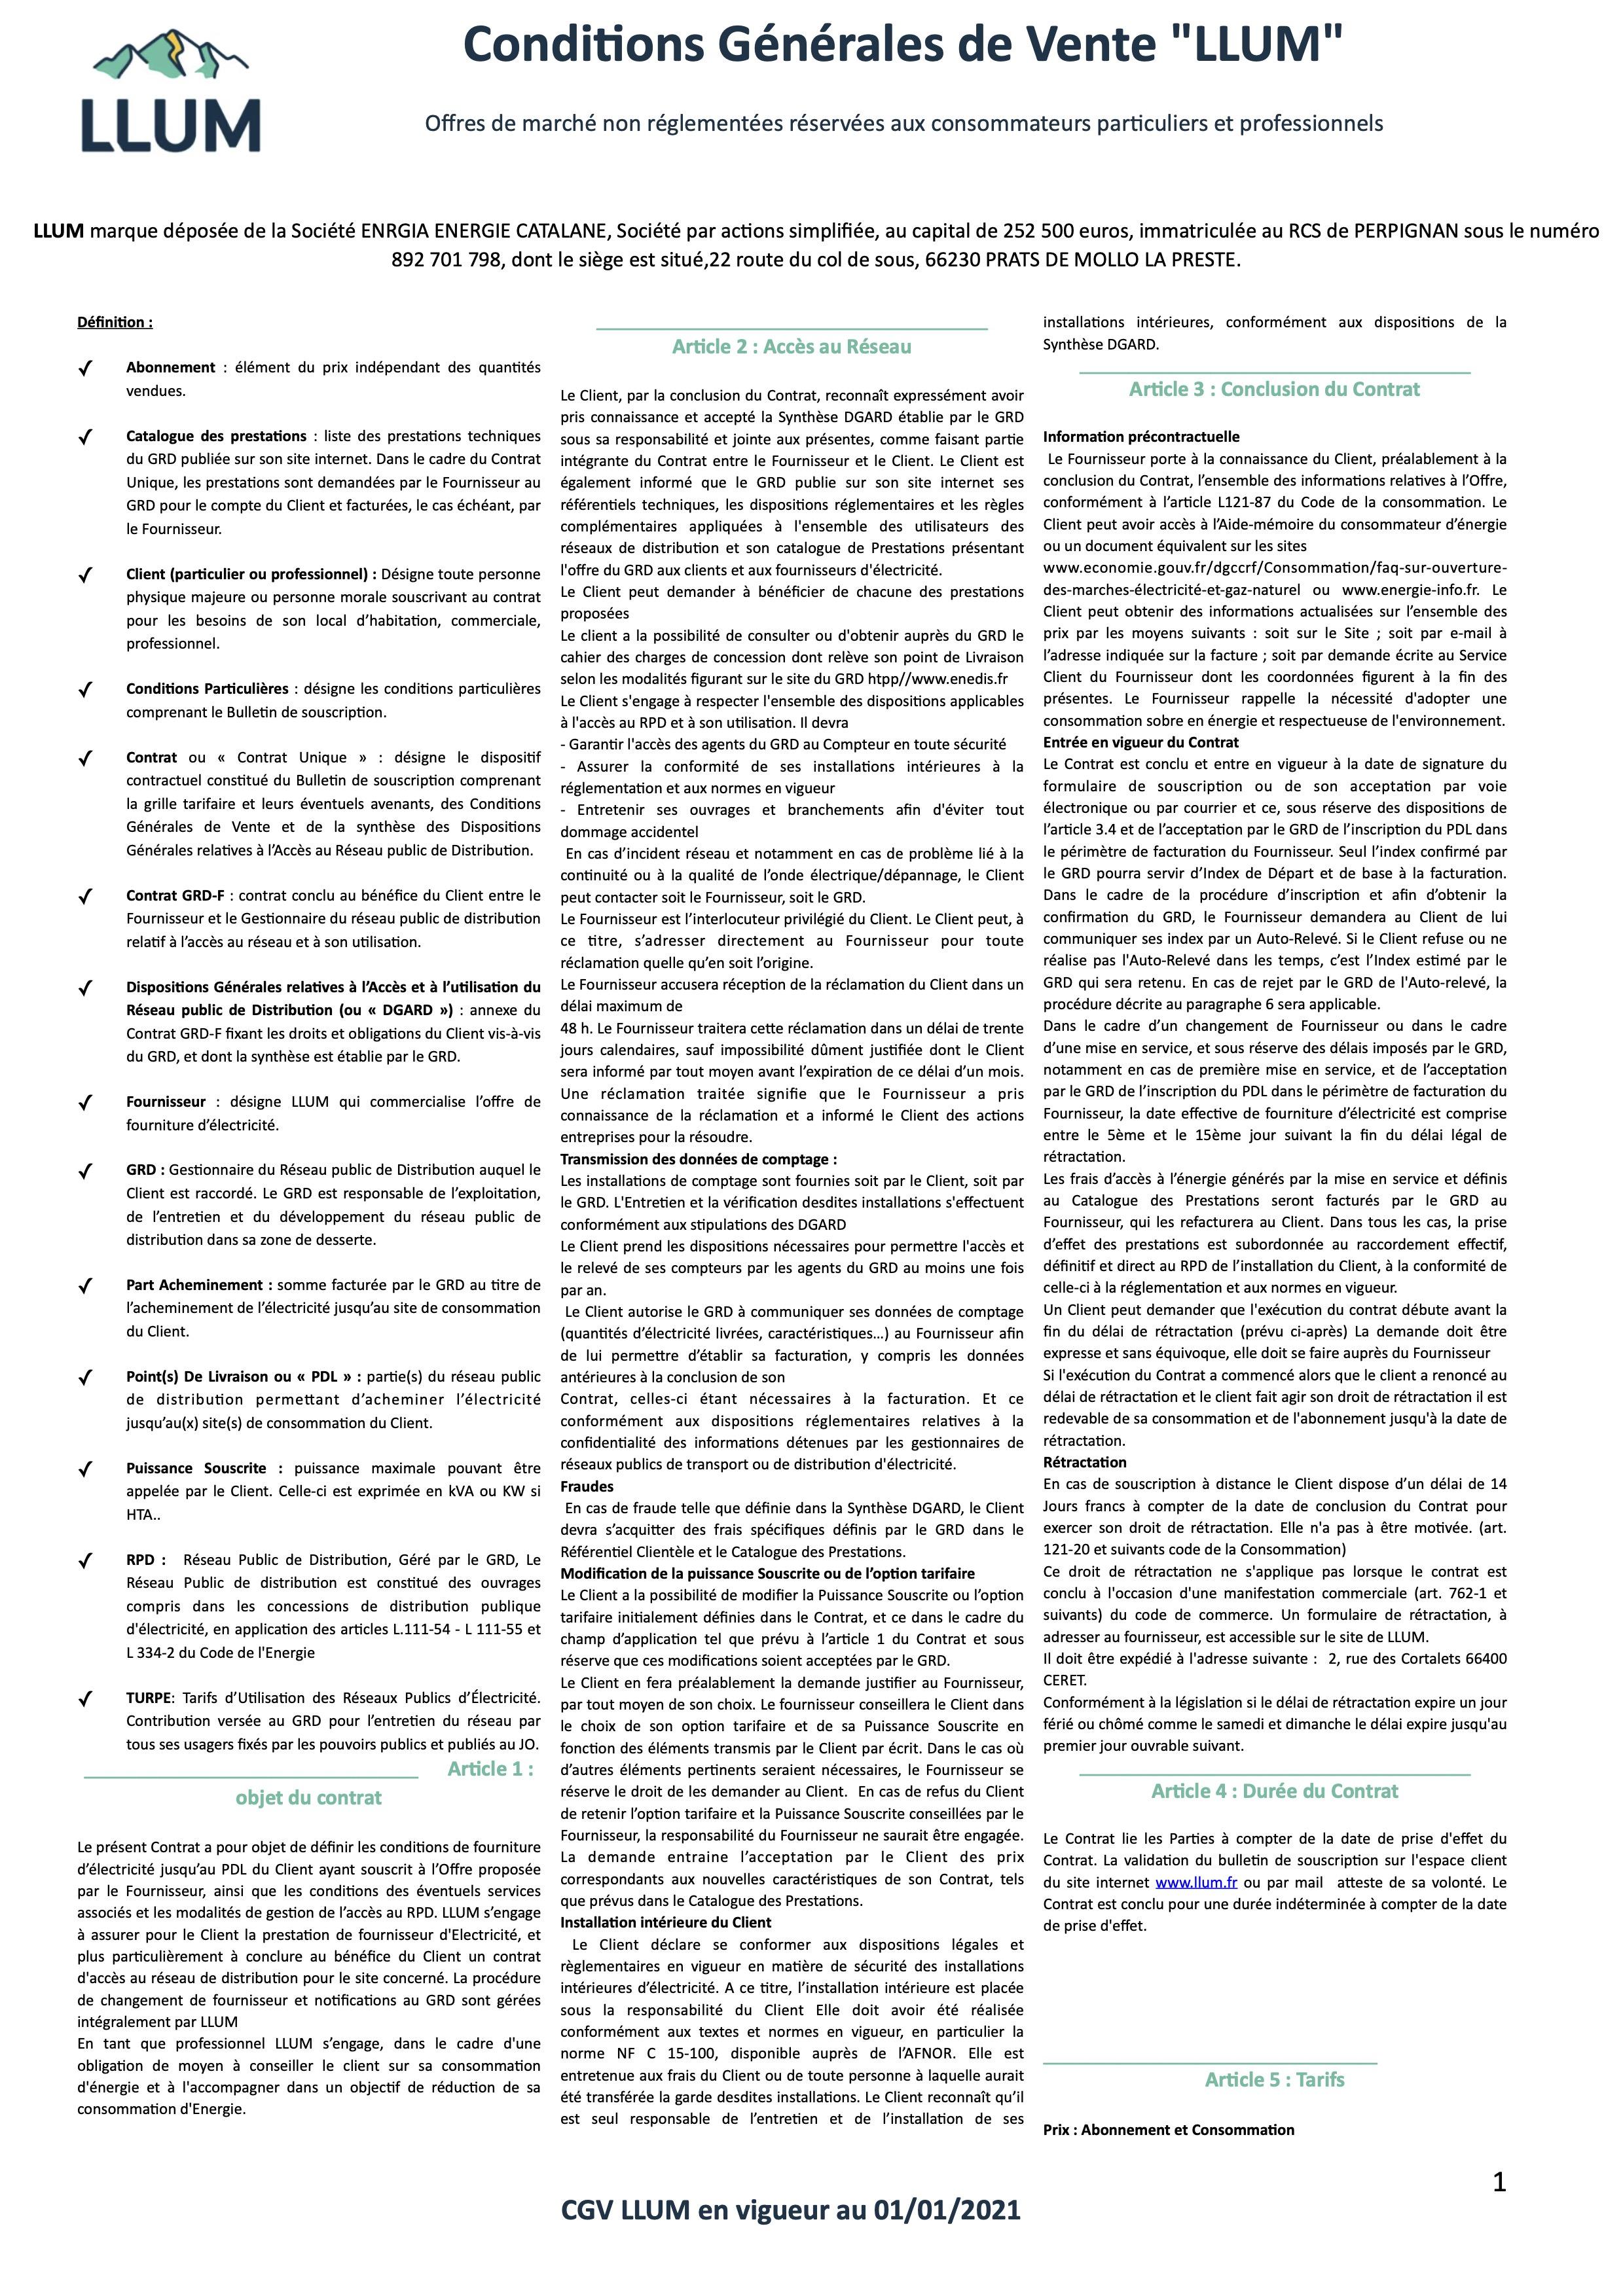 210712-CGV-LLUM-page-1